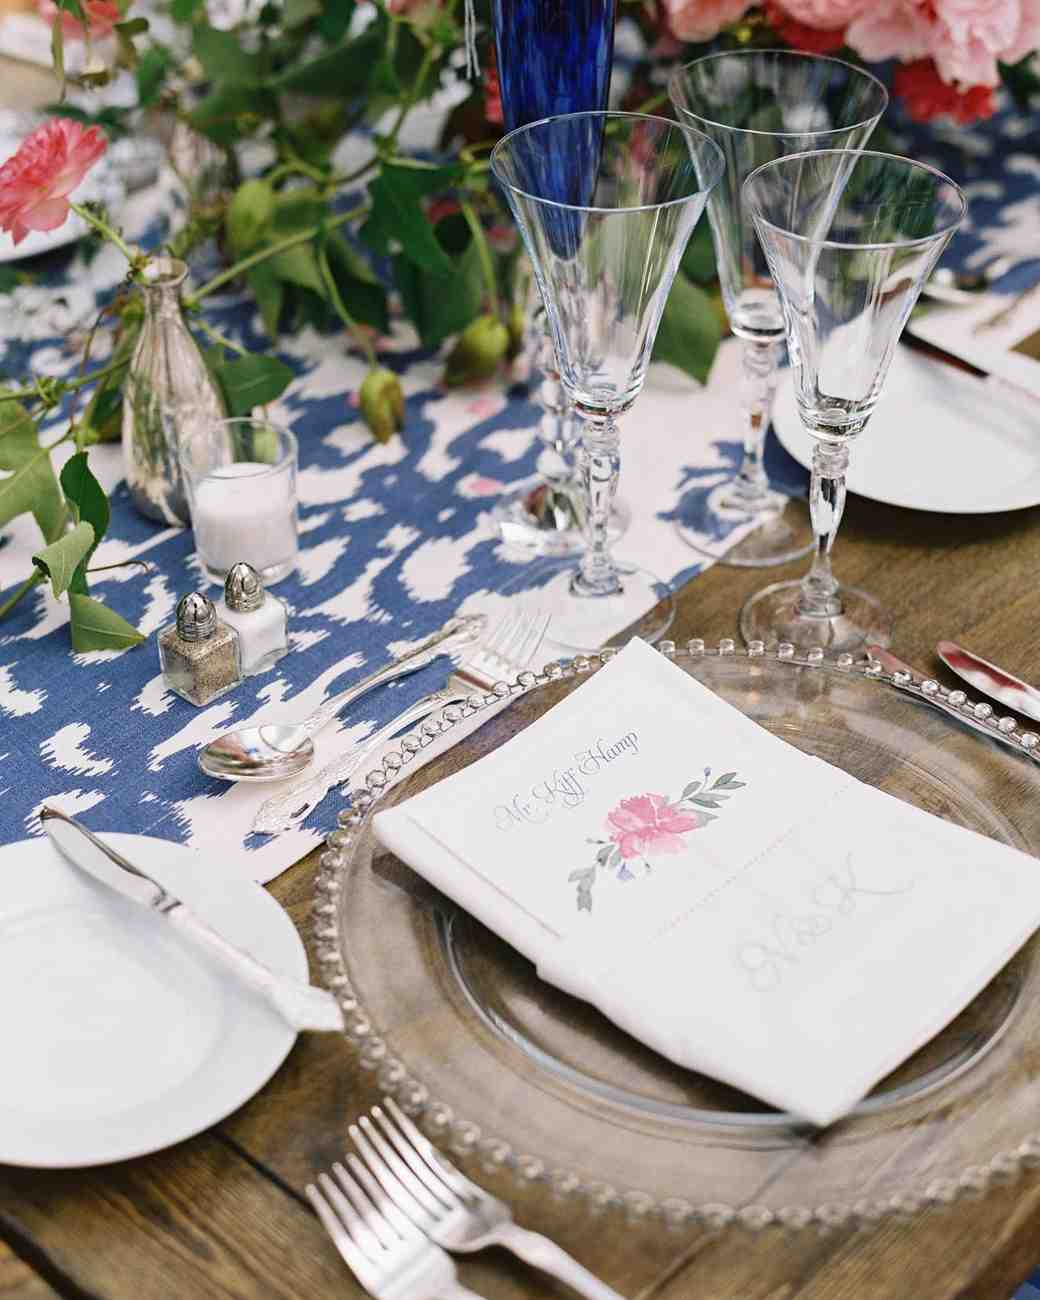 nikki-kiff-wedding-placesetting-004751009-s112766-0316.jpg